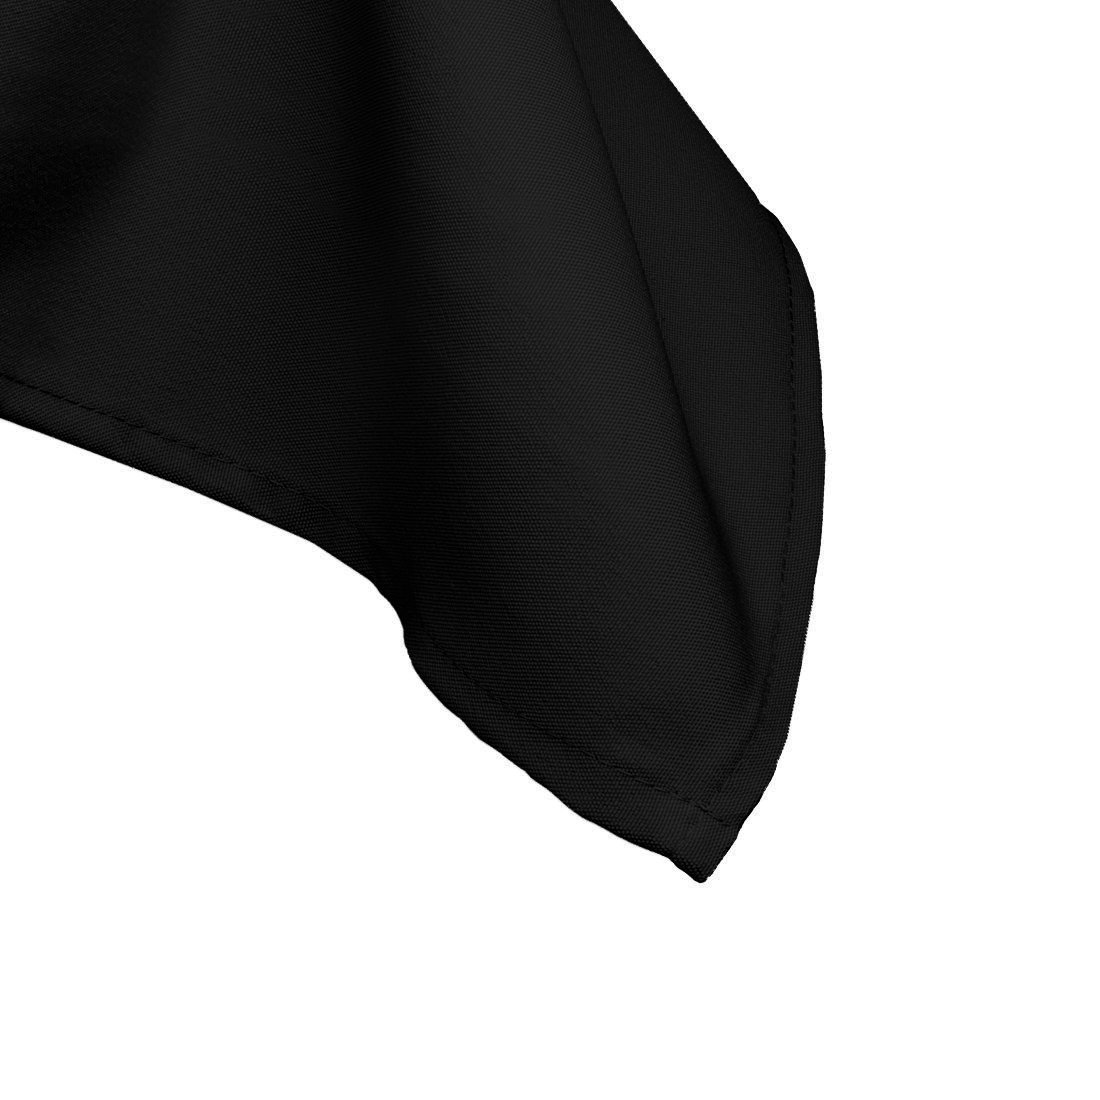 Comedor y Fiesta Cumplea/ños 90 x 132 Inches por Boda Suministro Negro Rectangular Algod/ón Poli/éster Mantel Cubierta para Boda Individual